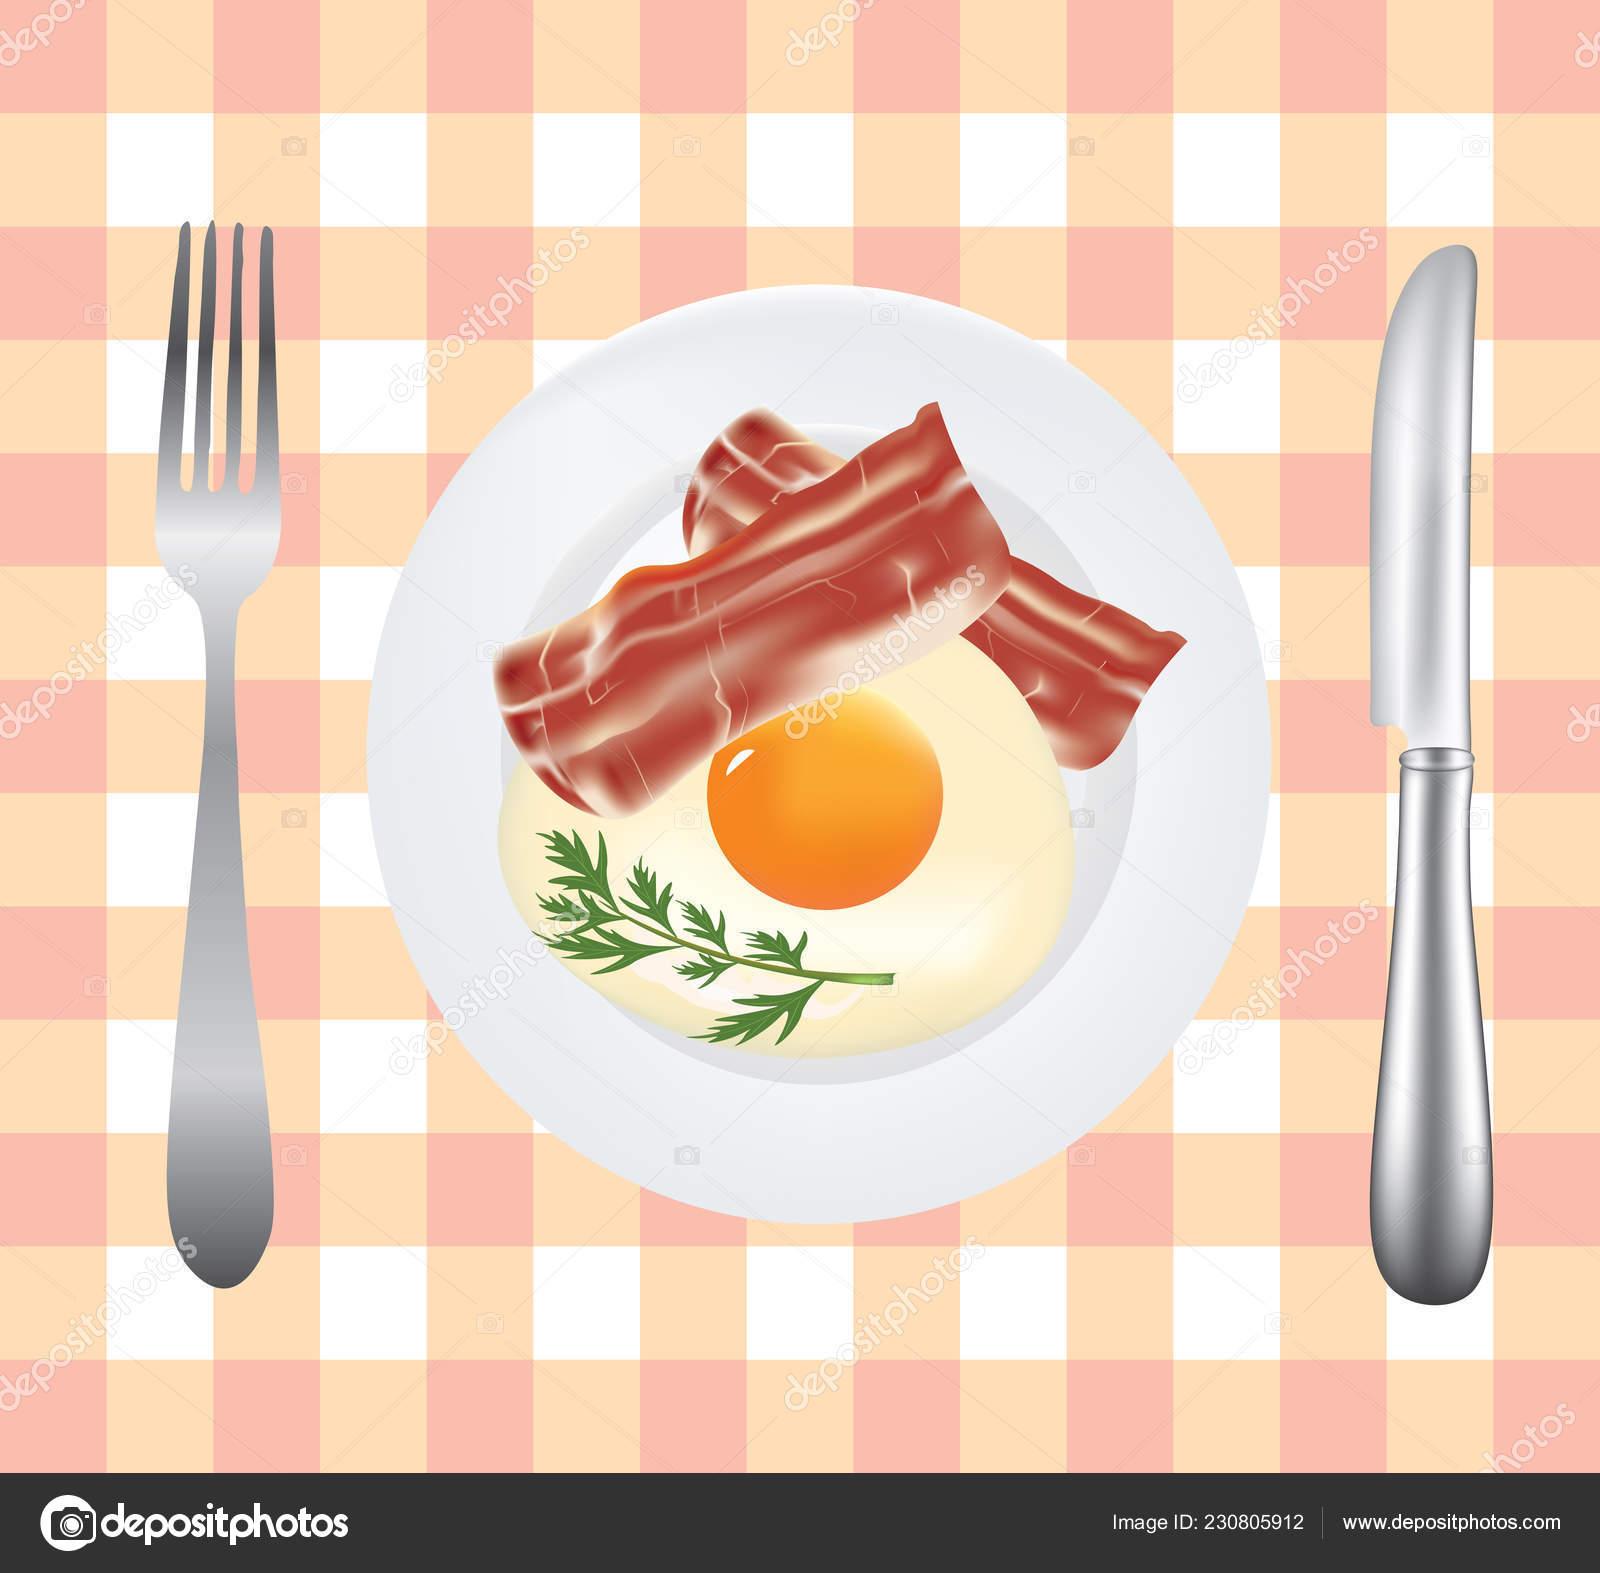 Breakfast Plate Egg Bacon Vector Stock Vector C Marijamara 230805912